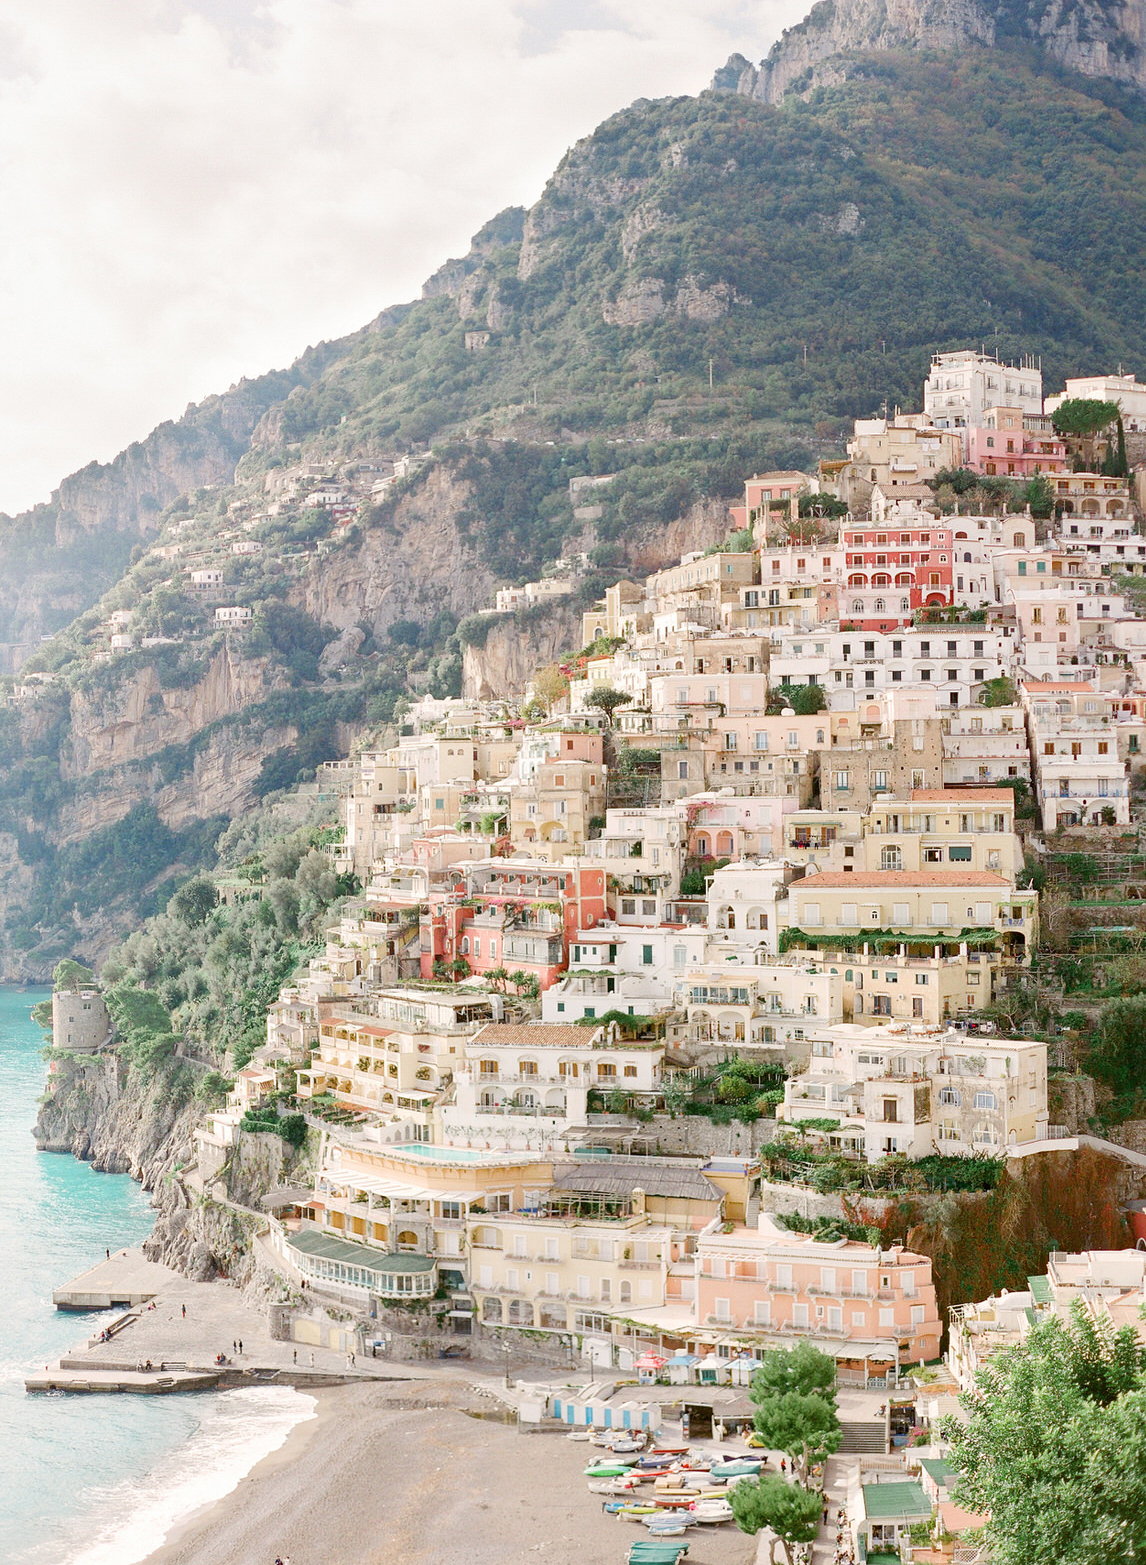 artiese-amalfi-coast-ravello-positano-italy-destination-wedding-photographer-000020850010